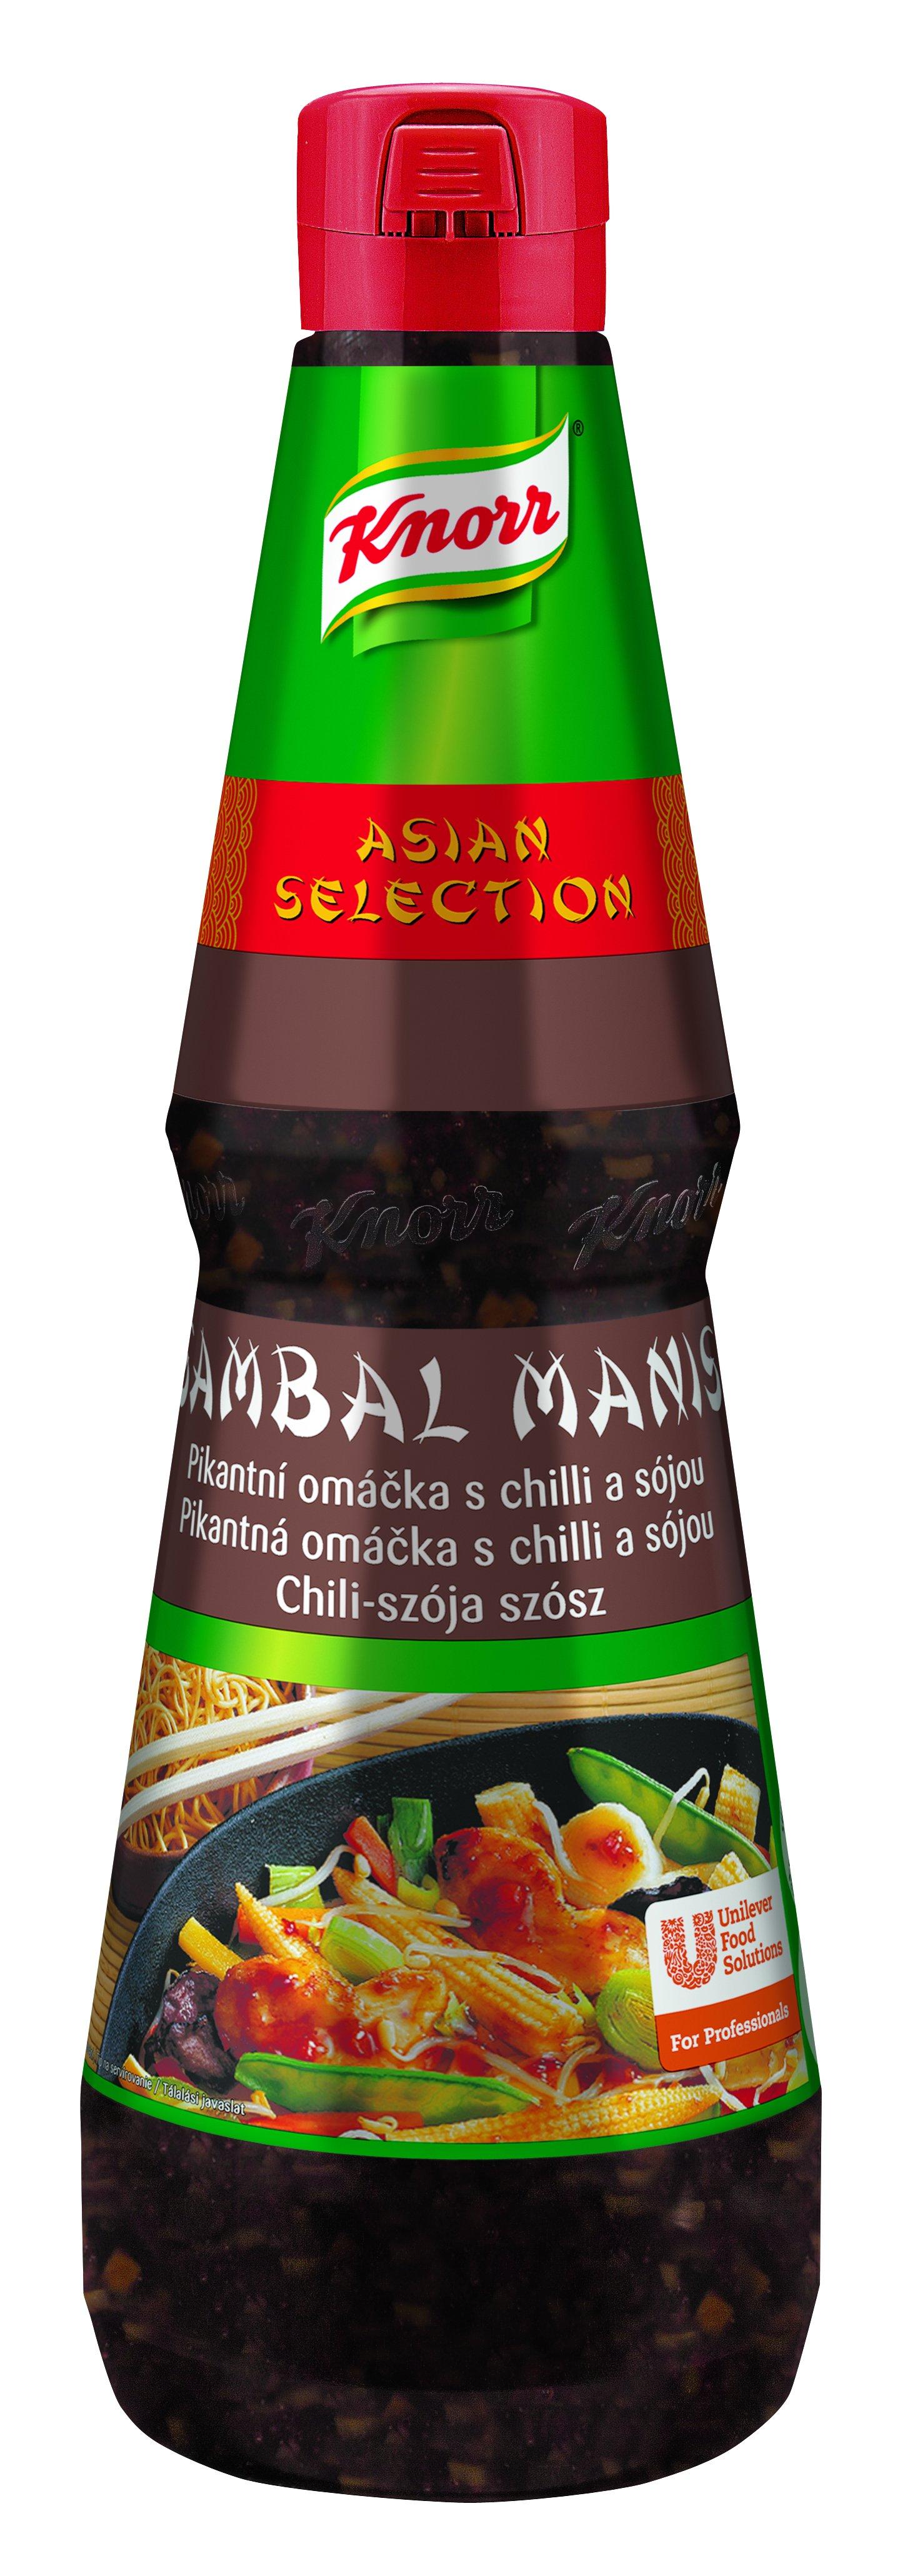 Knorr Sambal  Manis Omáčka chilli a sója 1L -